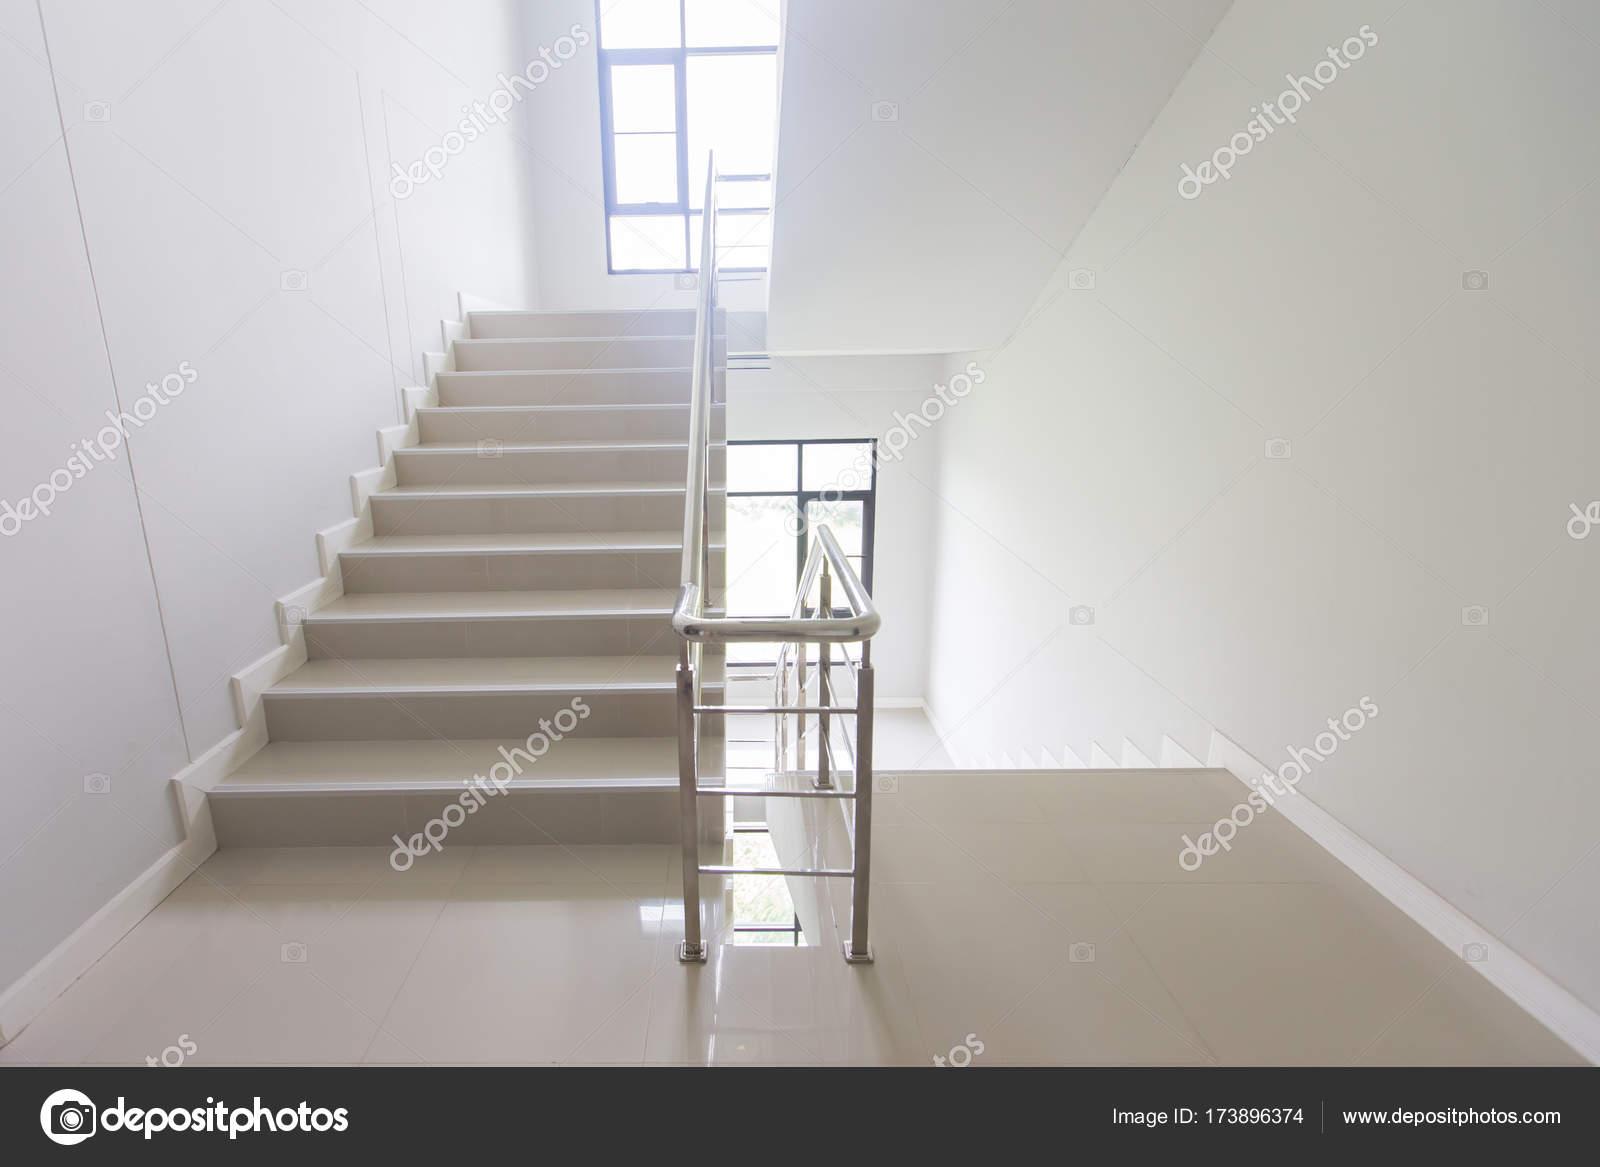 Escalera salida de emergencia en hotel primer plano - Escaleras interiores modernas ...